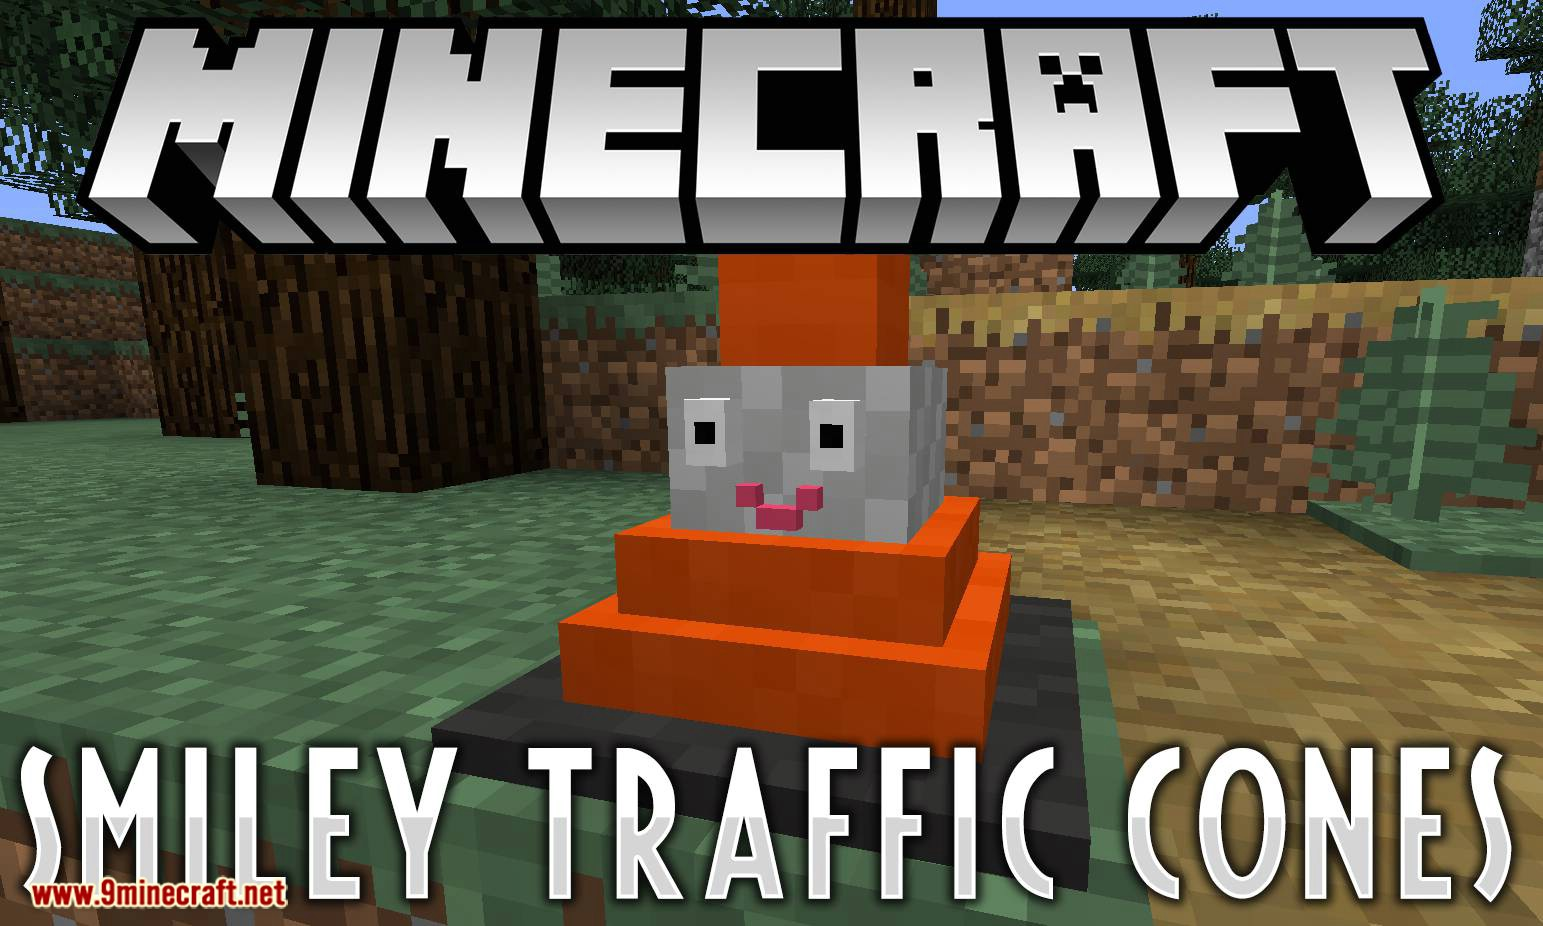 Smiley Traffic Cones mod for minecraft logo